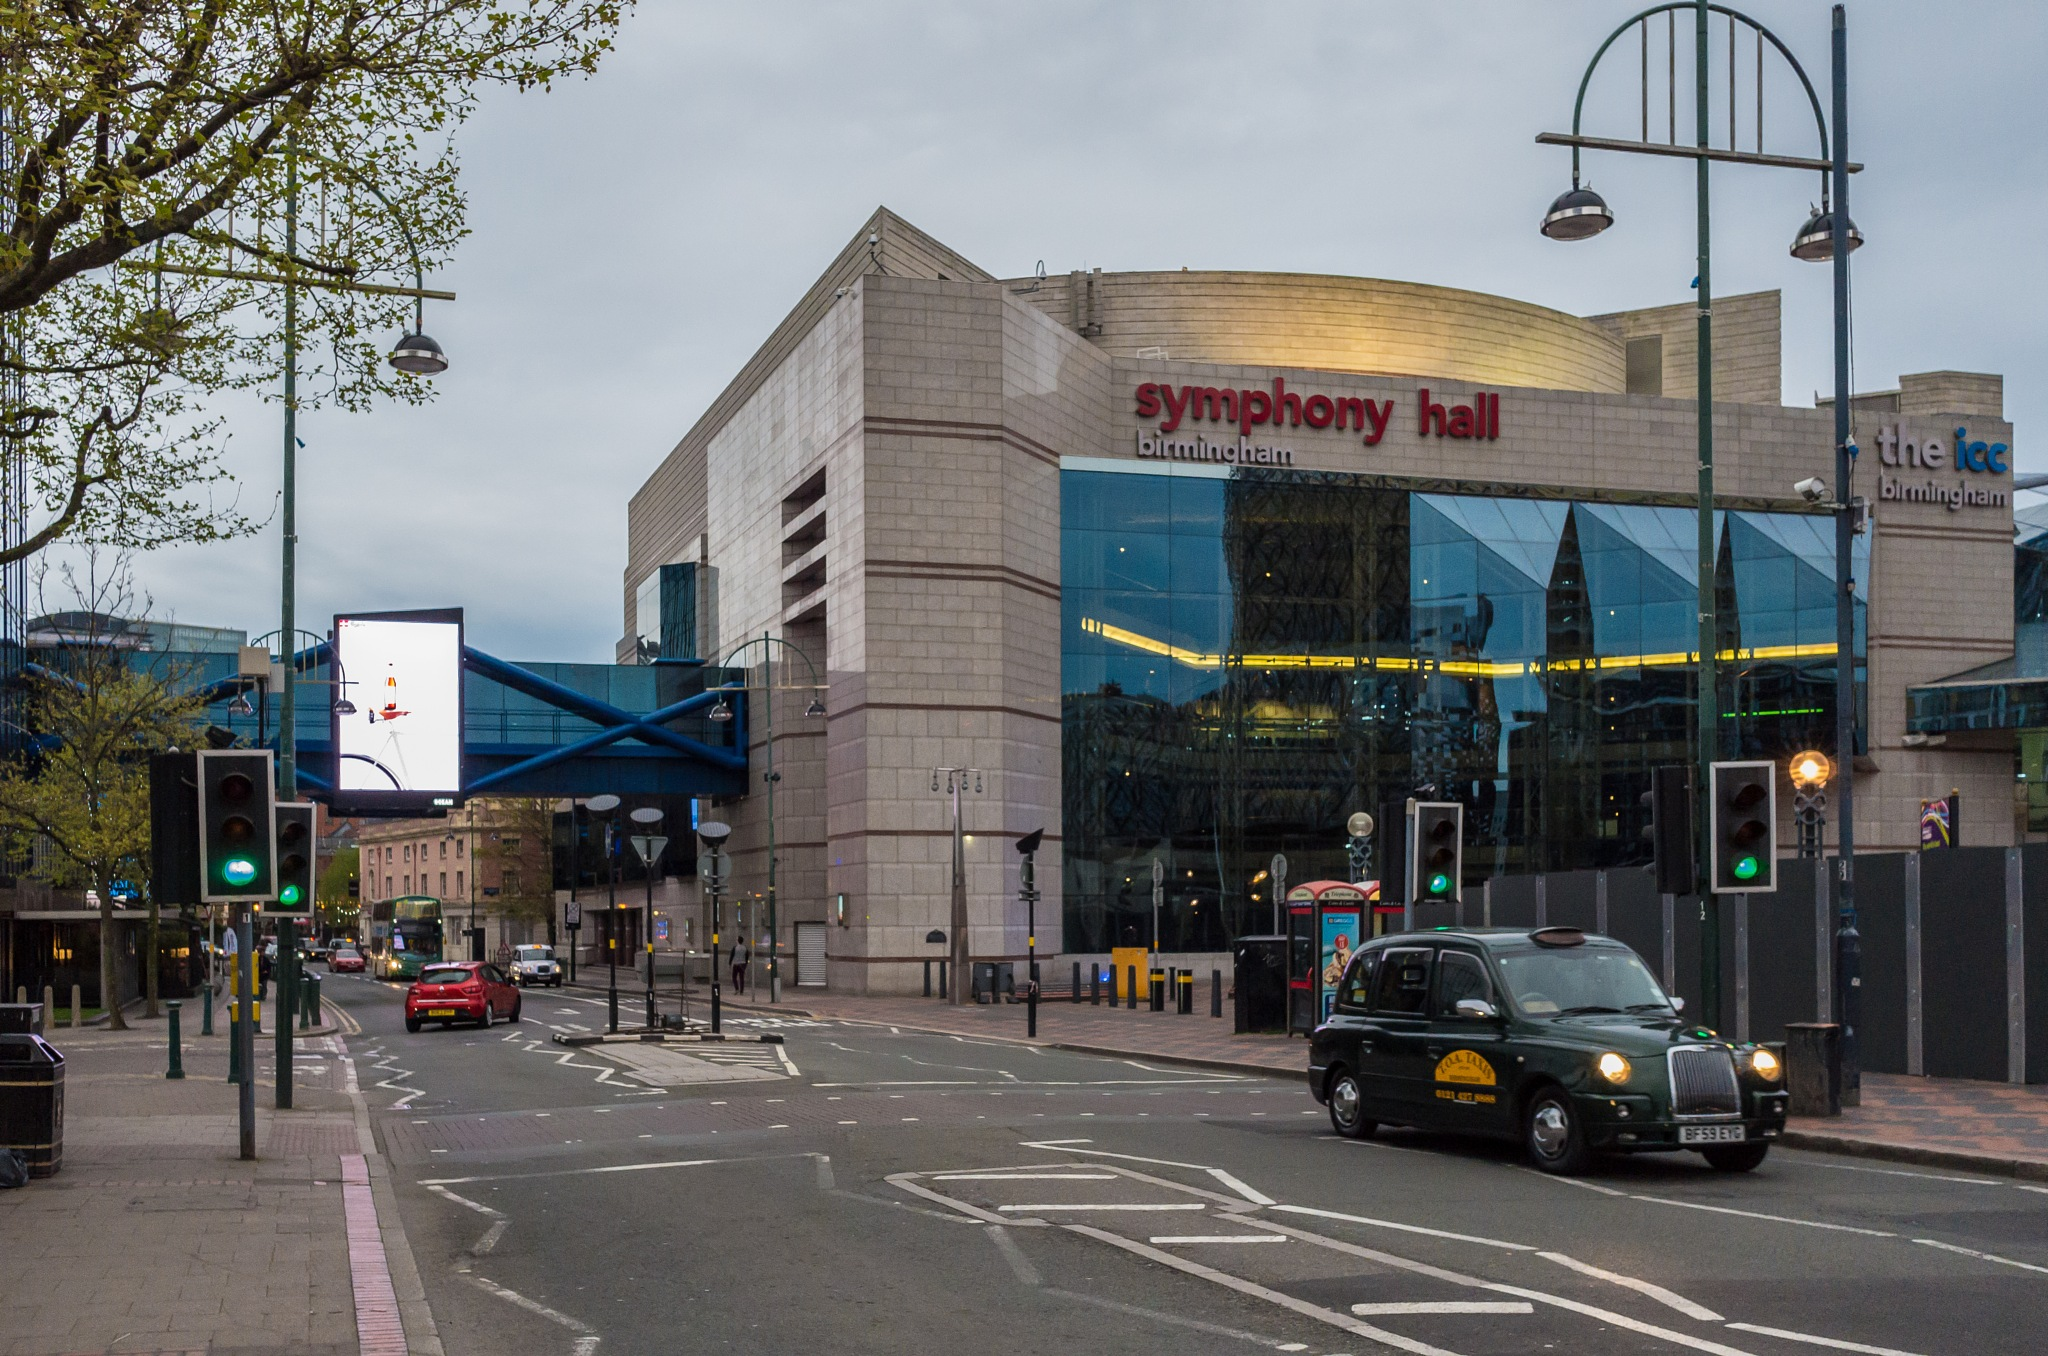 Symphony Hall and ICC, Birmingham UK by john.coates.792